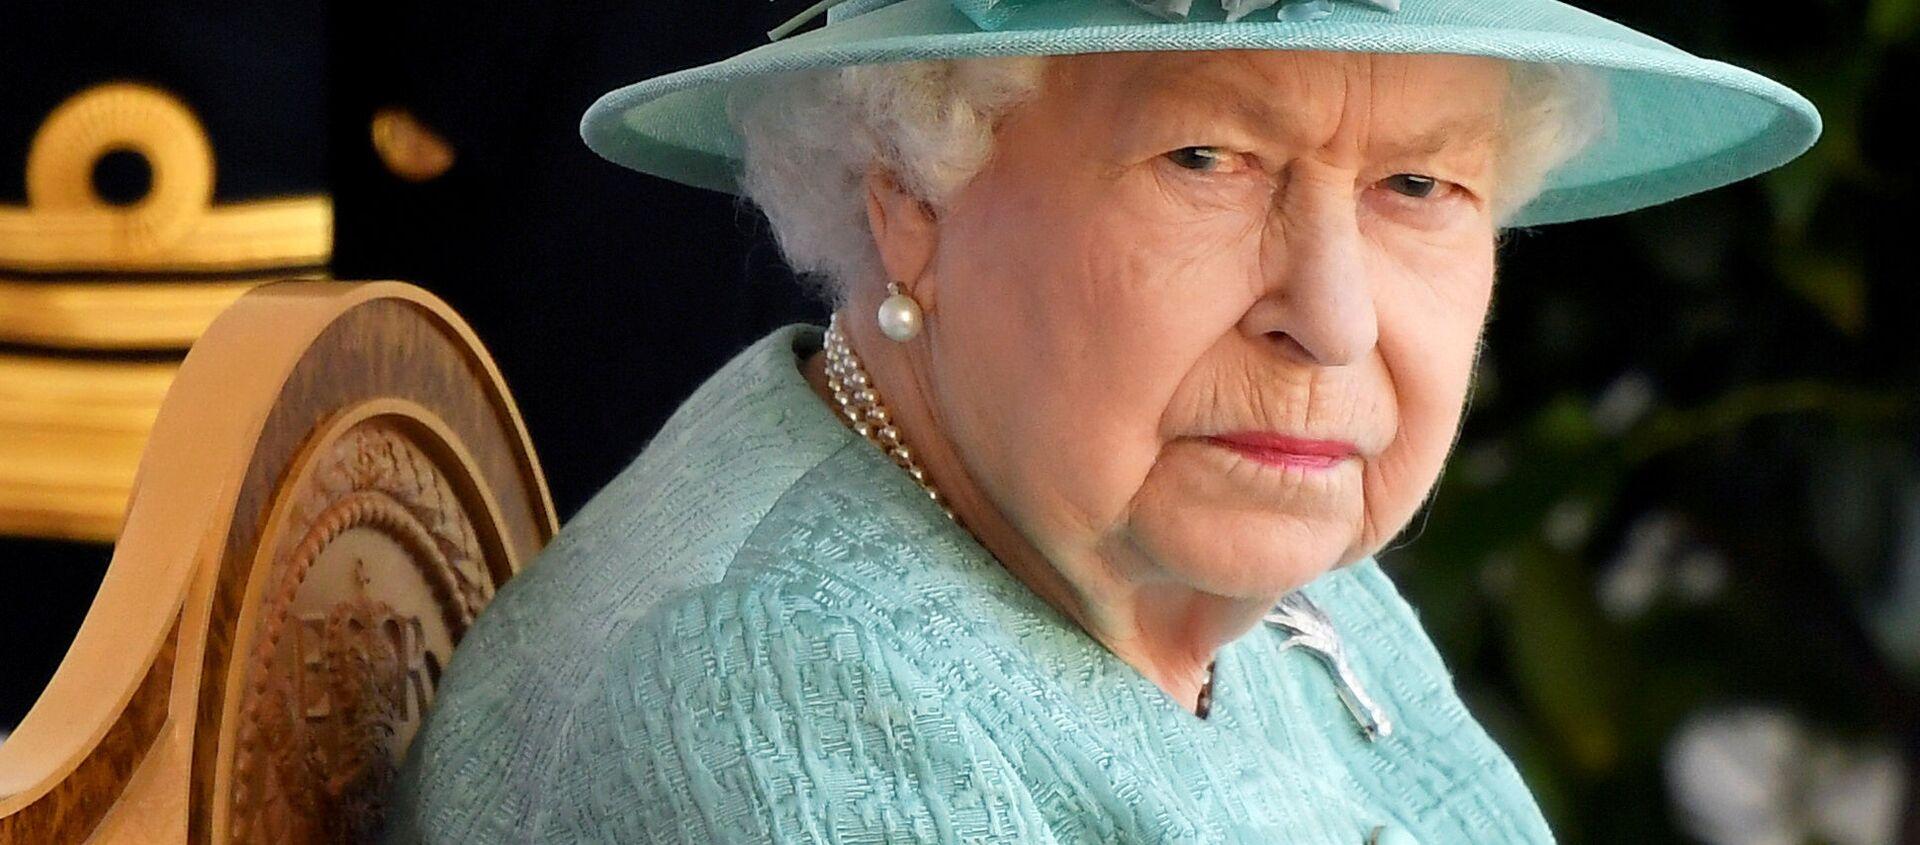 Britain's Queen Elizabeth attends a ceremony to mark her official birthday at Windsor Castle in Windsor, Britain, June 13, 2020 - Sputnik International, 1920, 22.08.2021